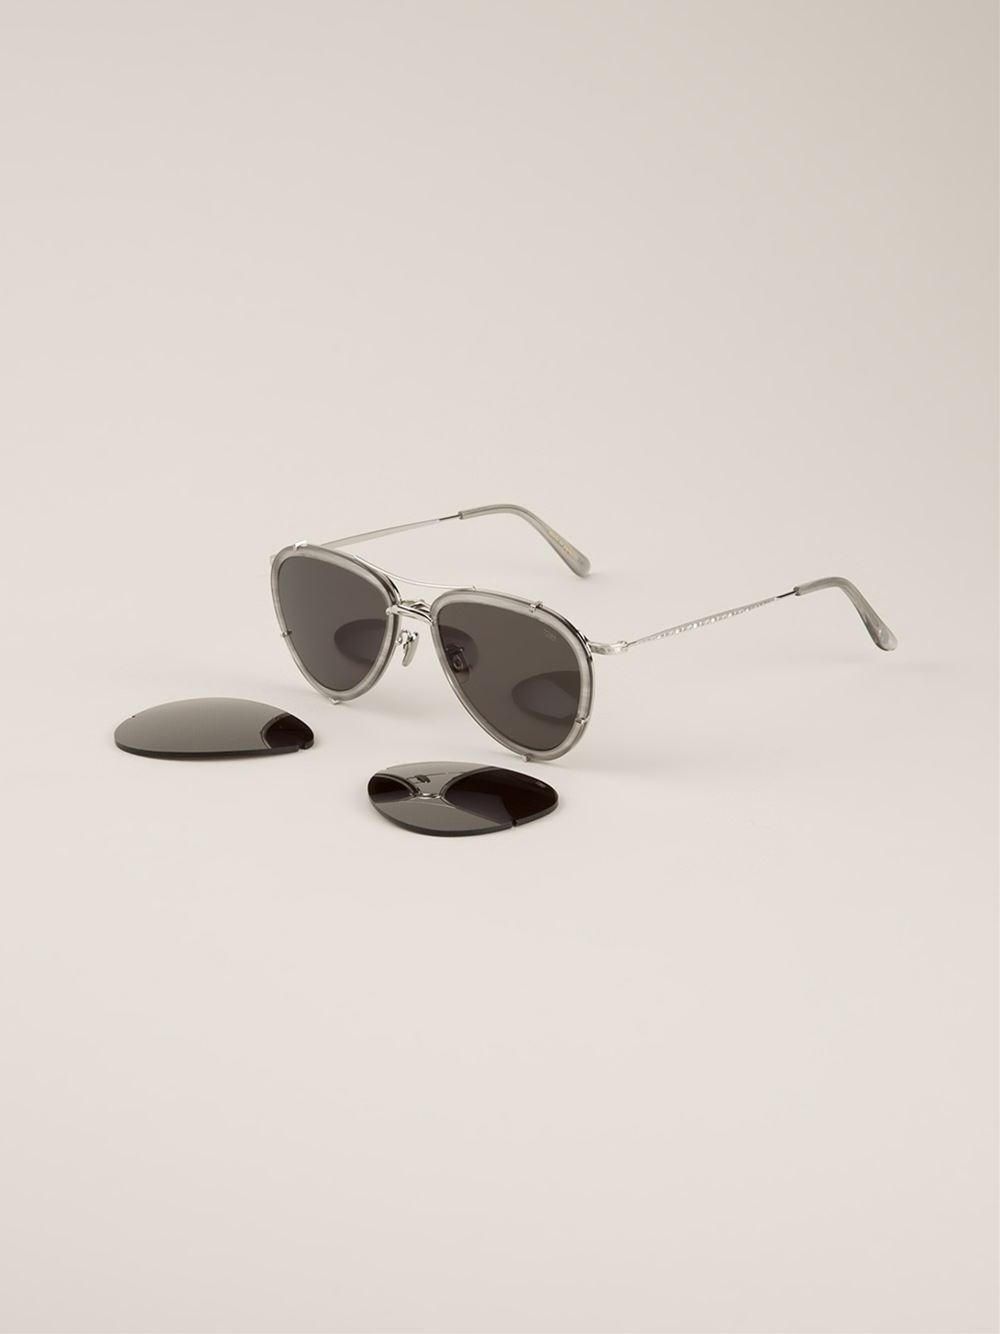 Eyevan 7285 Model 721' Sunglasses in Grey (Grey)